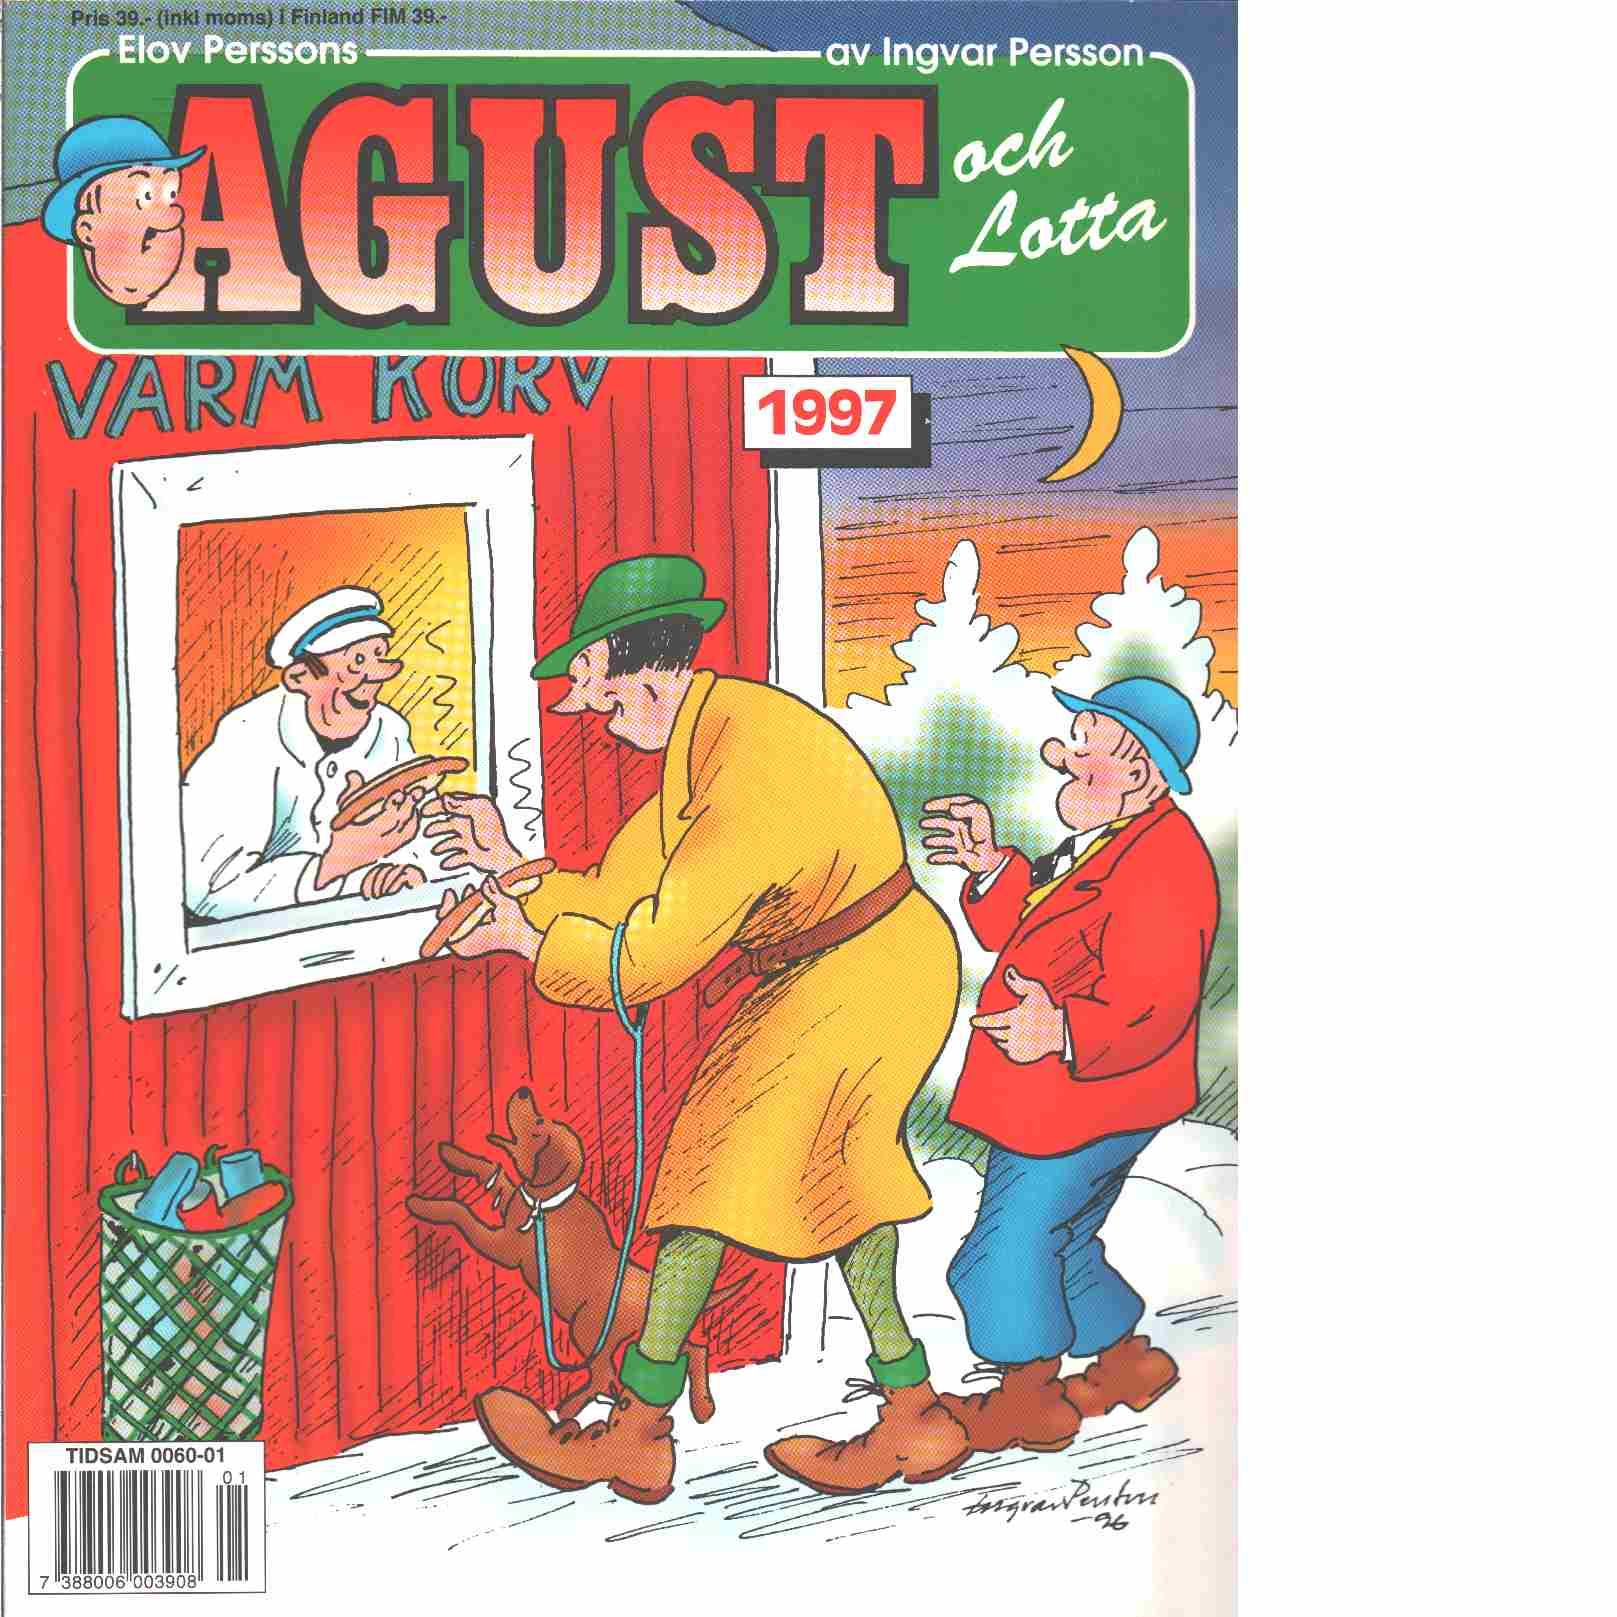 Agust och Lotta - Persson, Ingvar